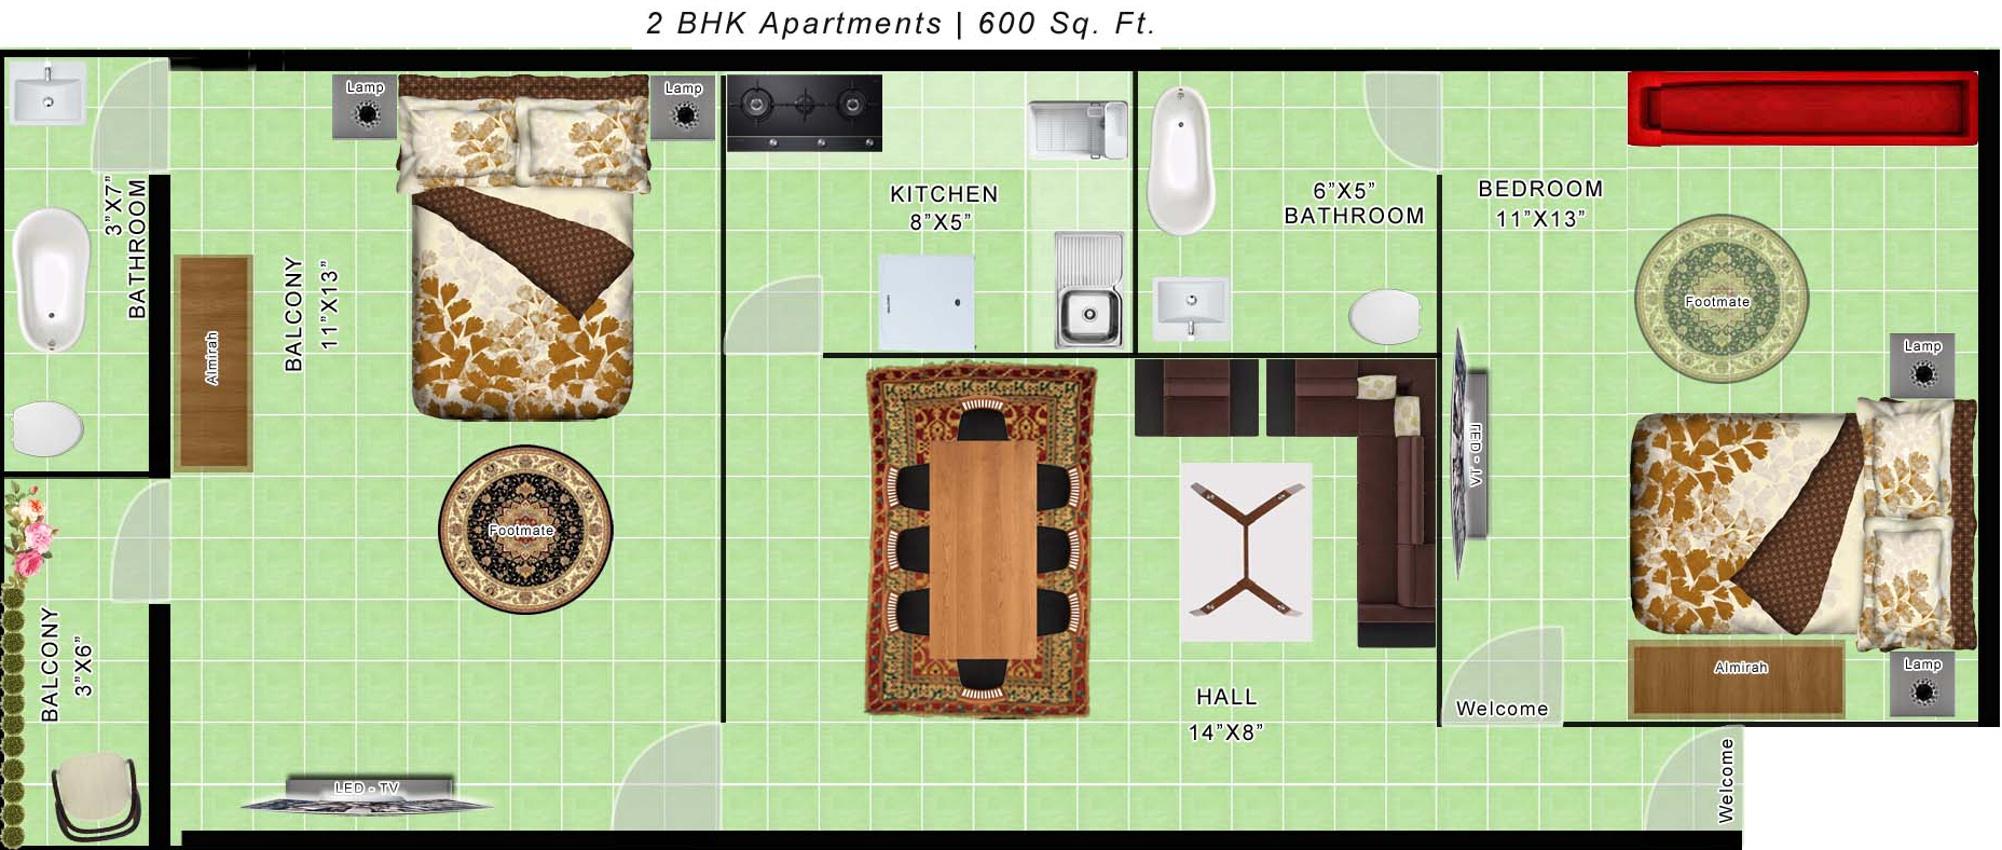 Habitech habitech apartments in sector 14 dwarka delhi for 12th floor apartments odessa